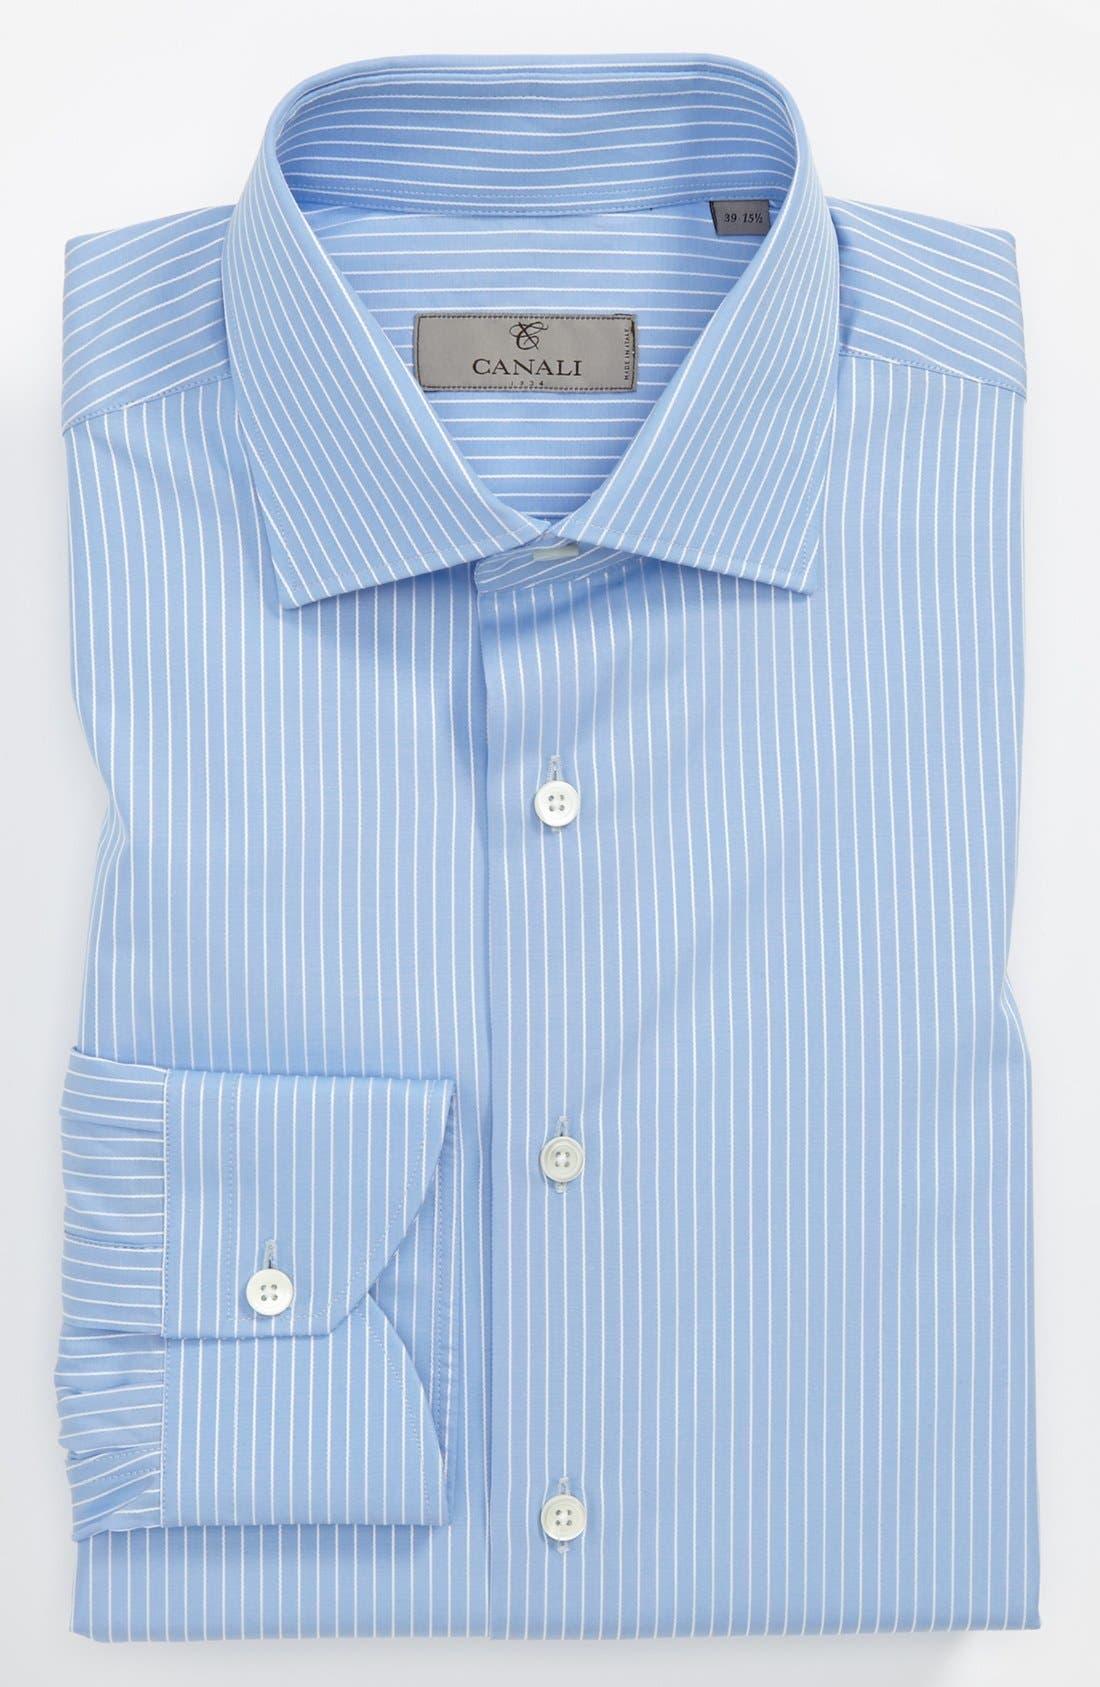 CANALI,                             Regular Fit Dress Shirt,                             Main thumbnail 1, color,                             400